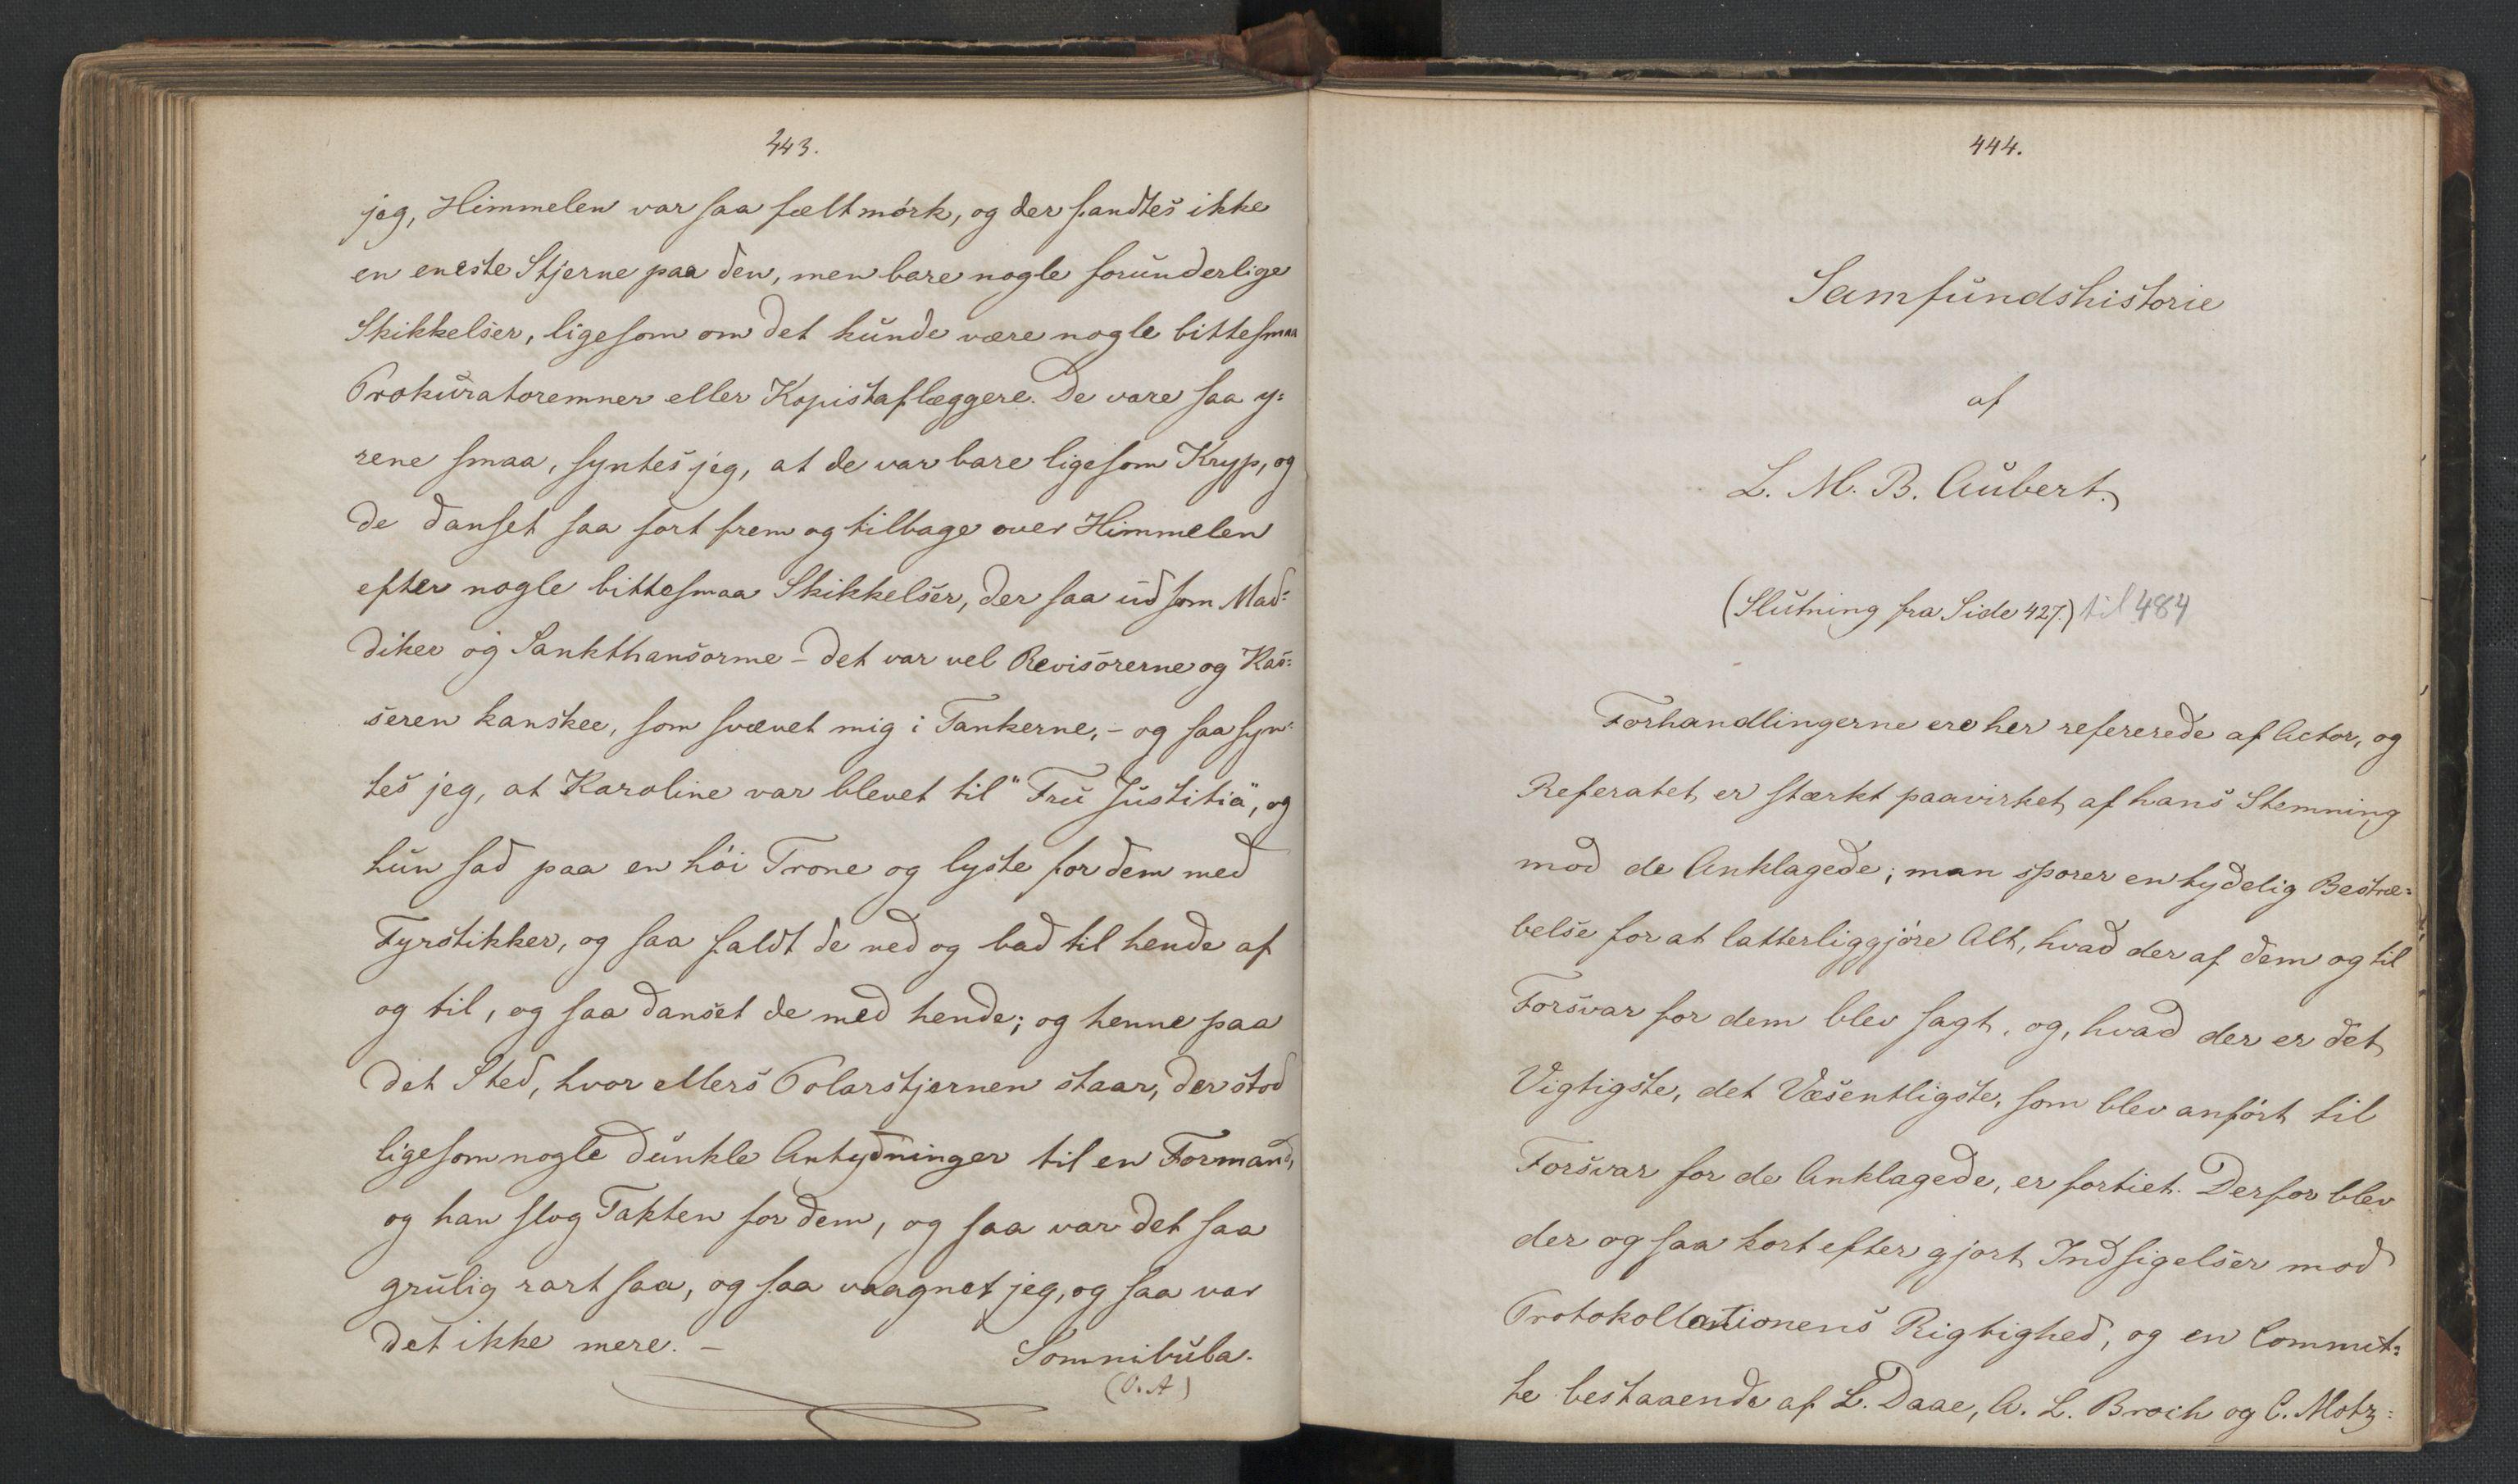 RA, Det Norske Studentersamfund, X/Xa/L0006, 1856-1857, s. 226